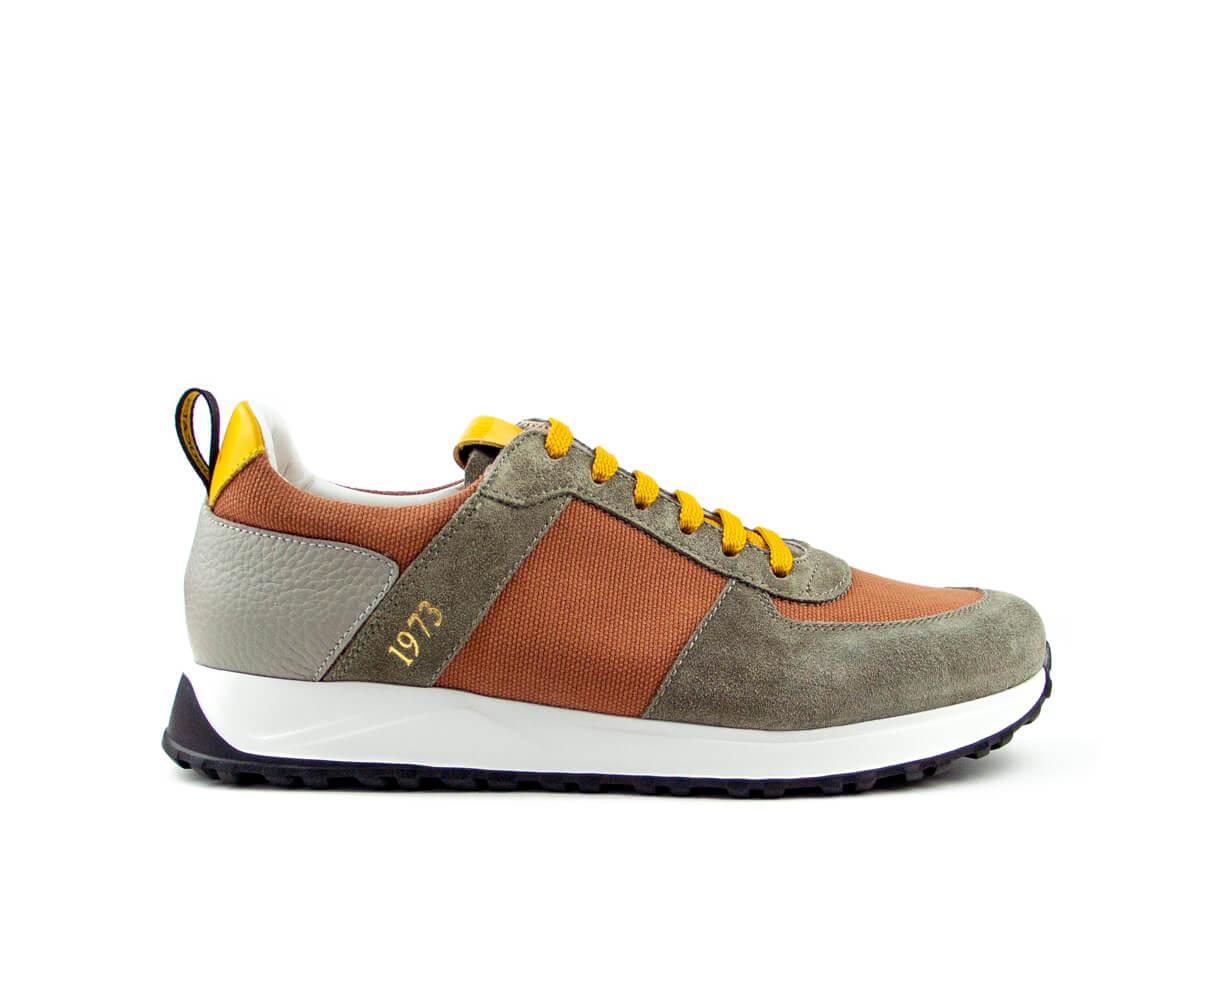 013 ecla scarpe rgb